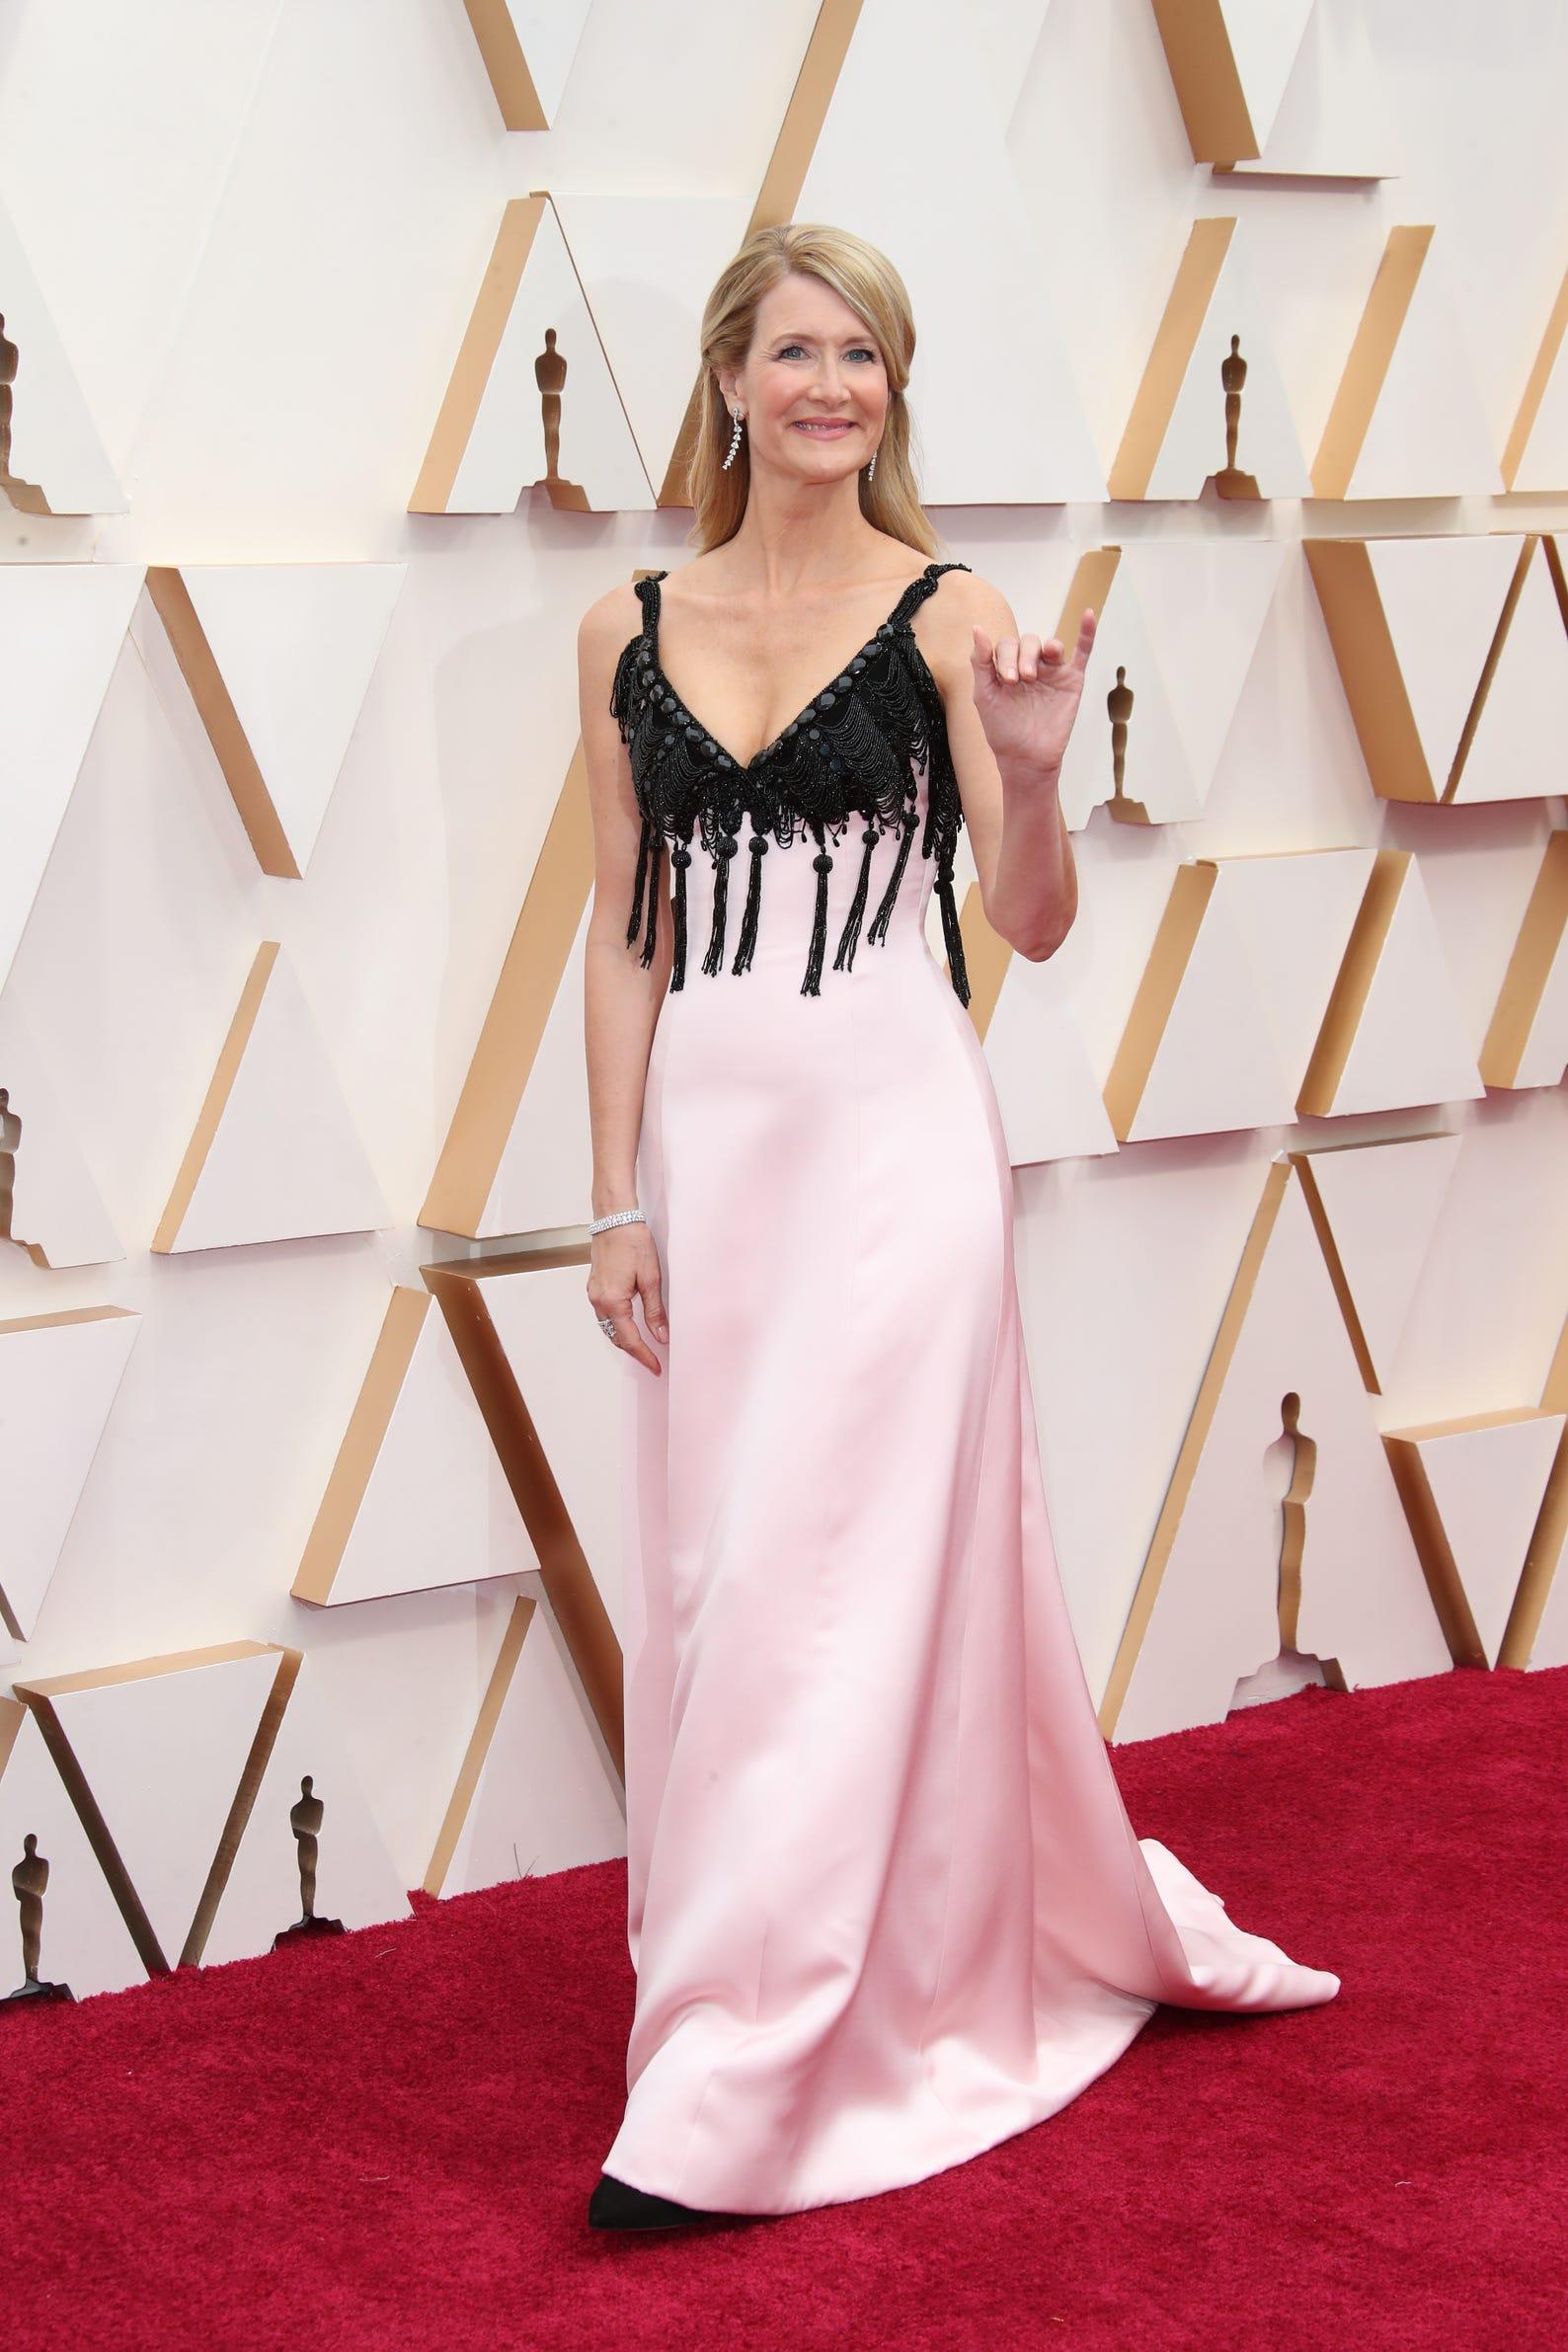 Oscars 2021 Best Dressed Oscars 2020: Laura Dern, Sandra Oh, Saoirse Ronan are worst dressed